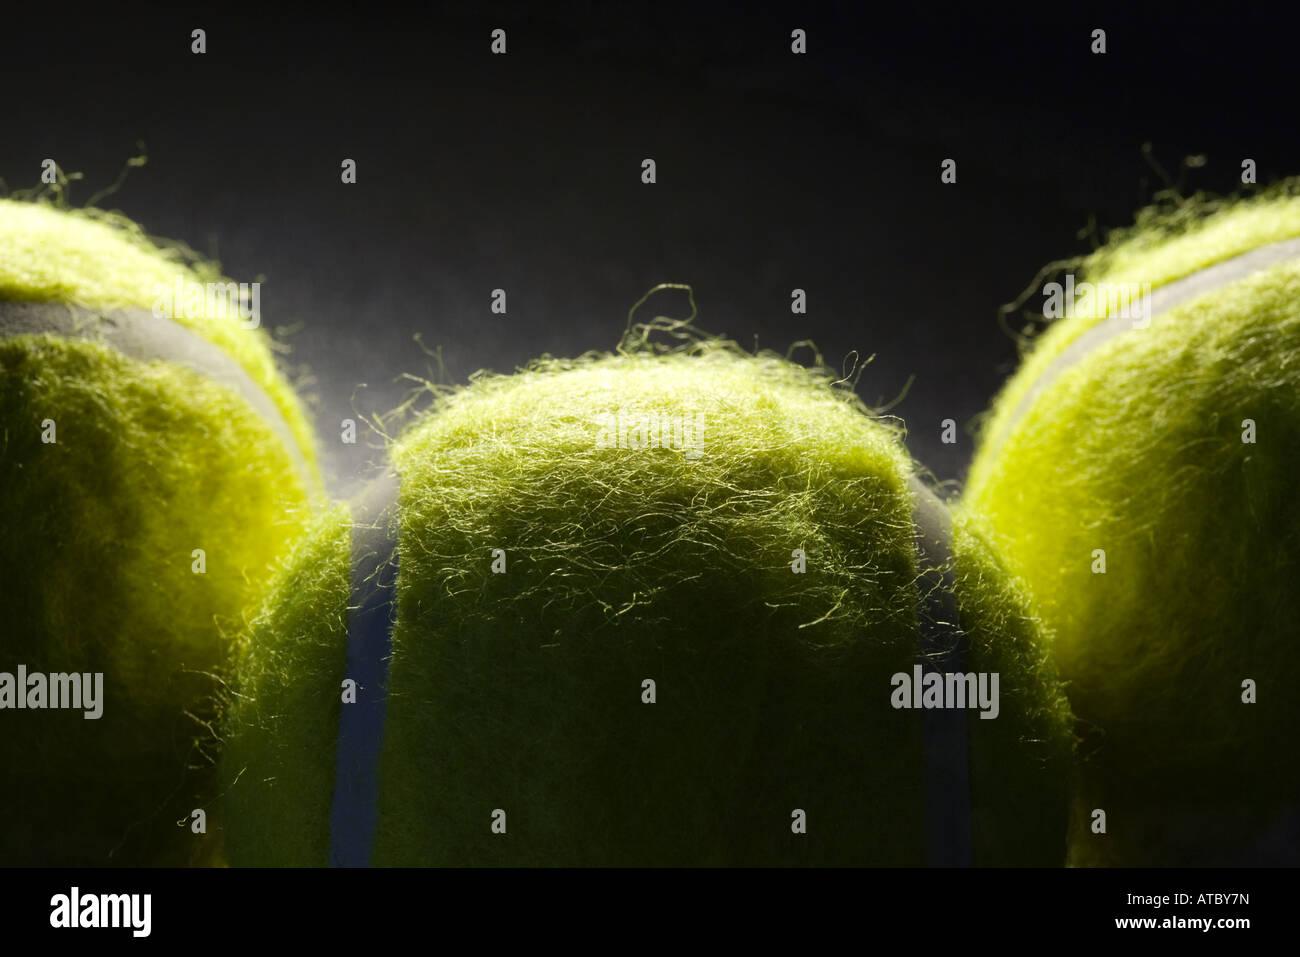 Three tennis balls, extreme close-up - Stock Image